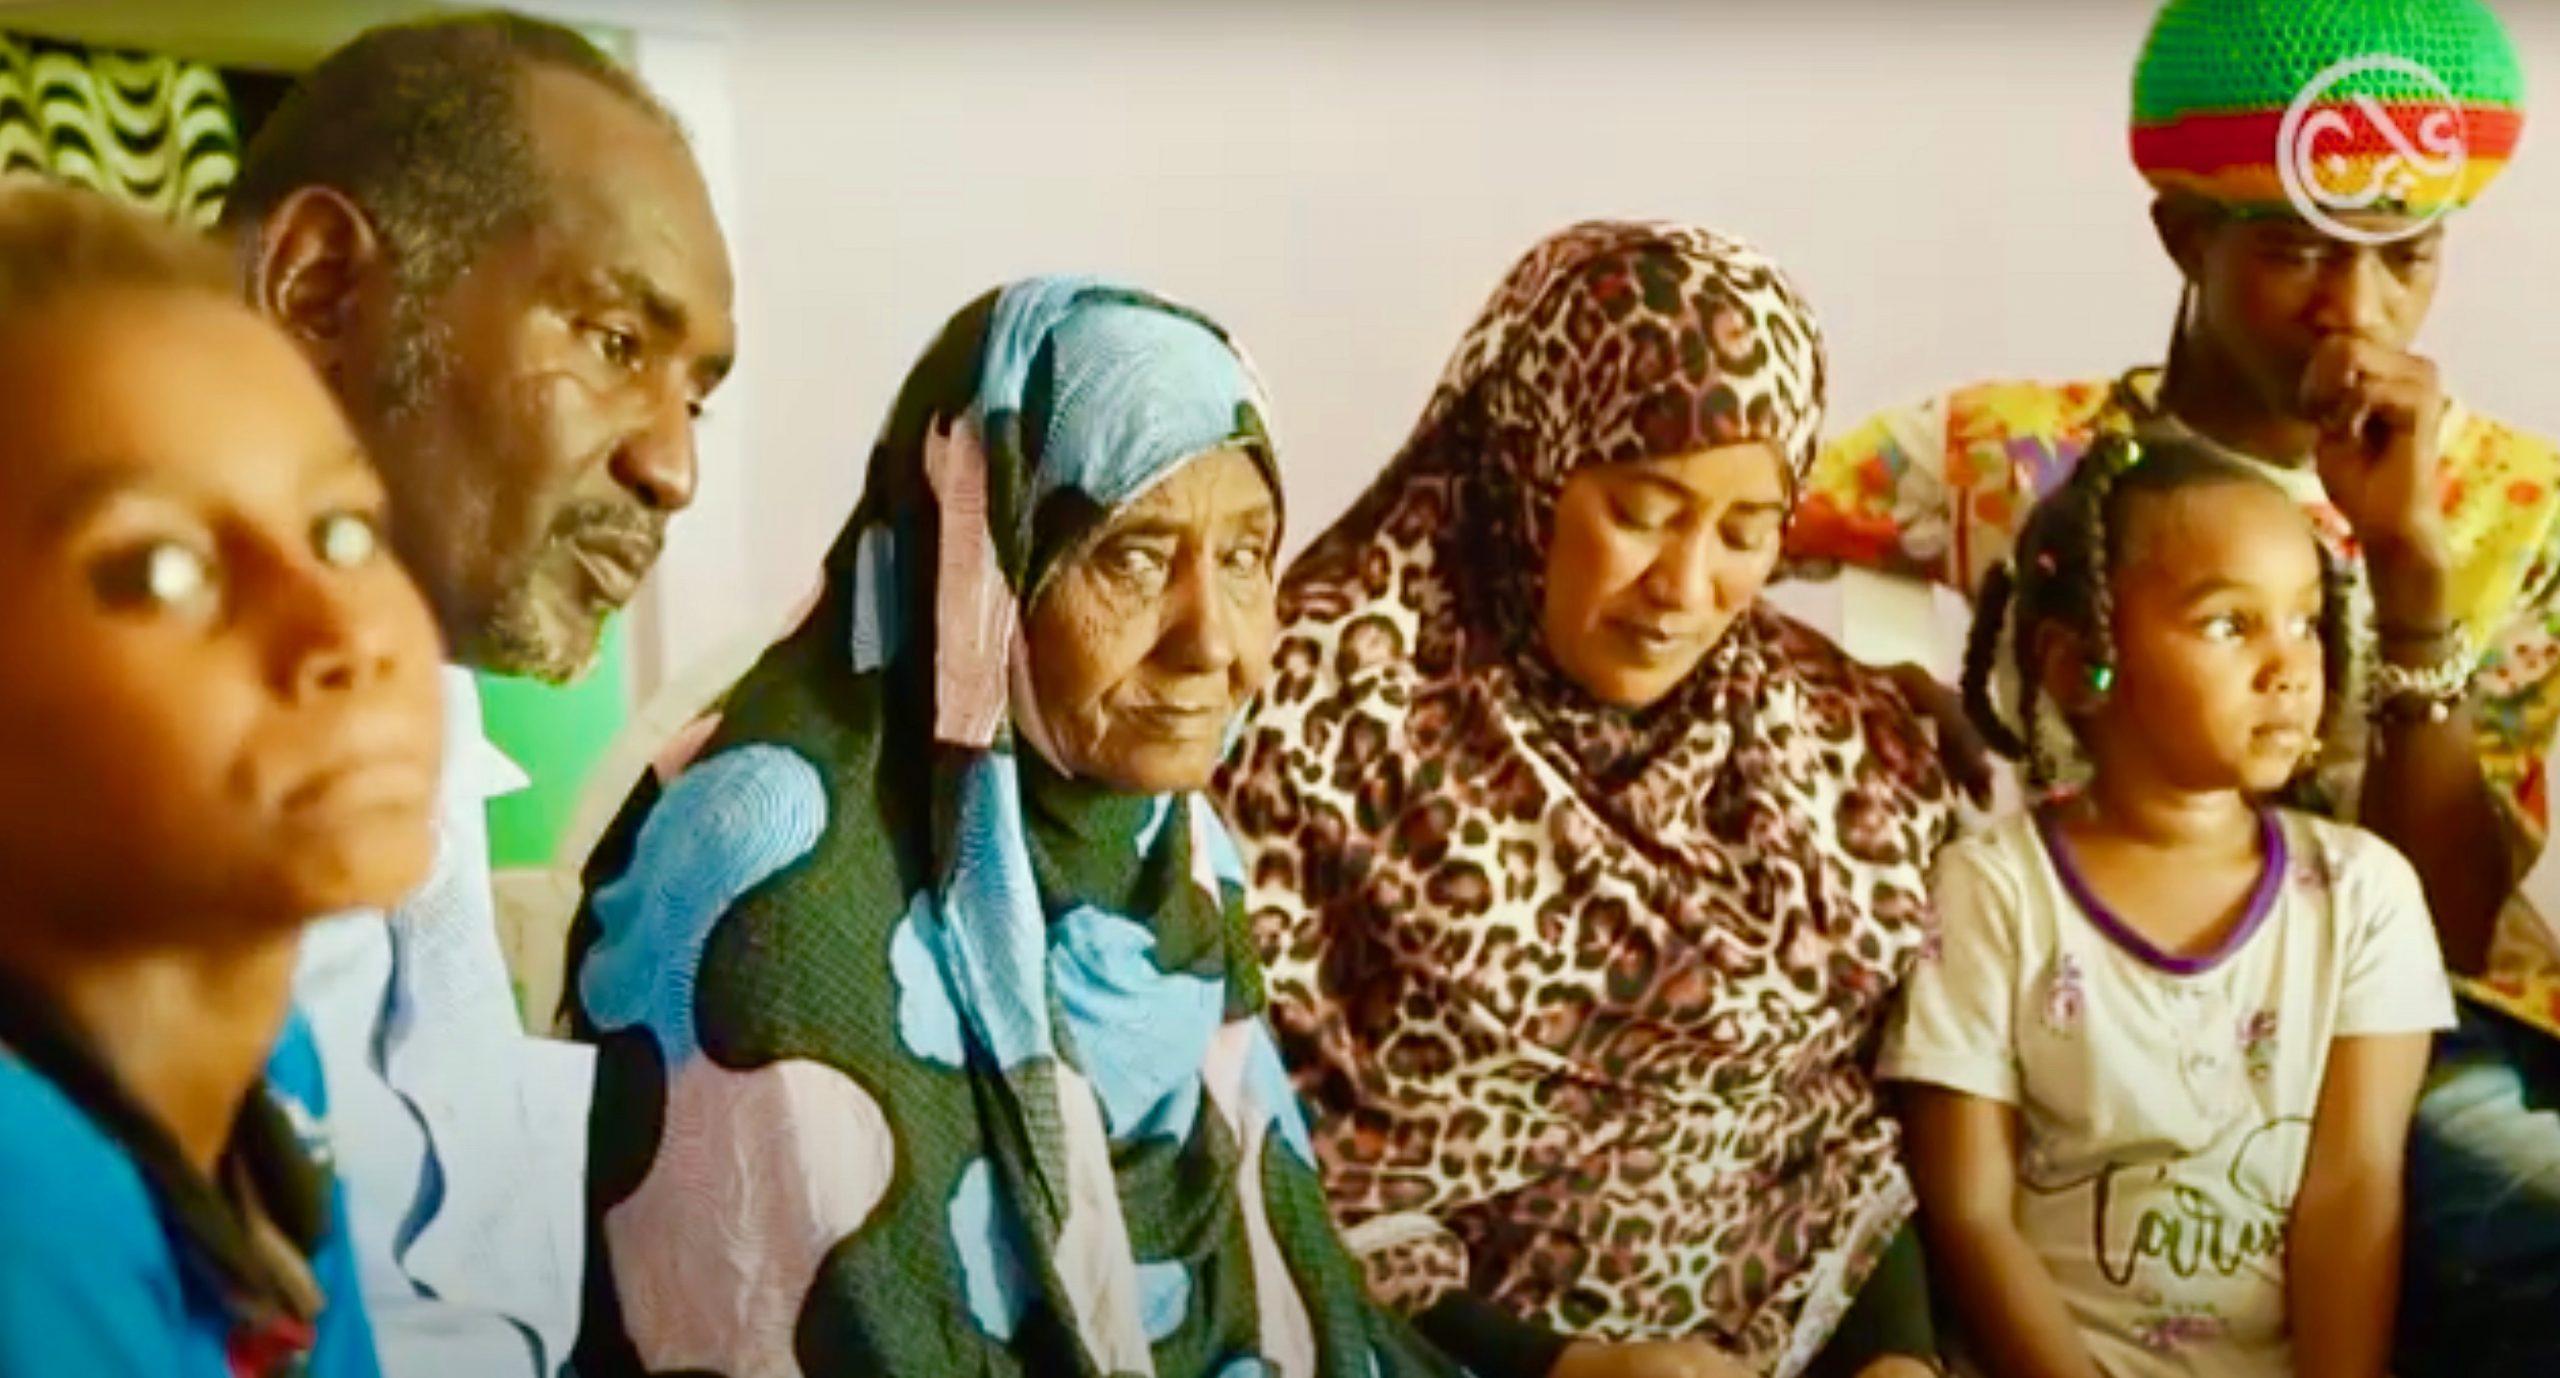 Wad Akar's family